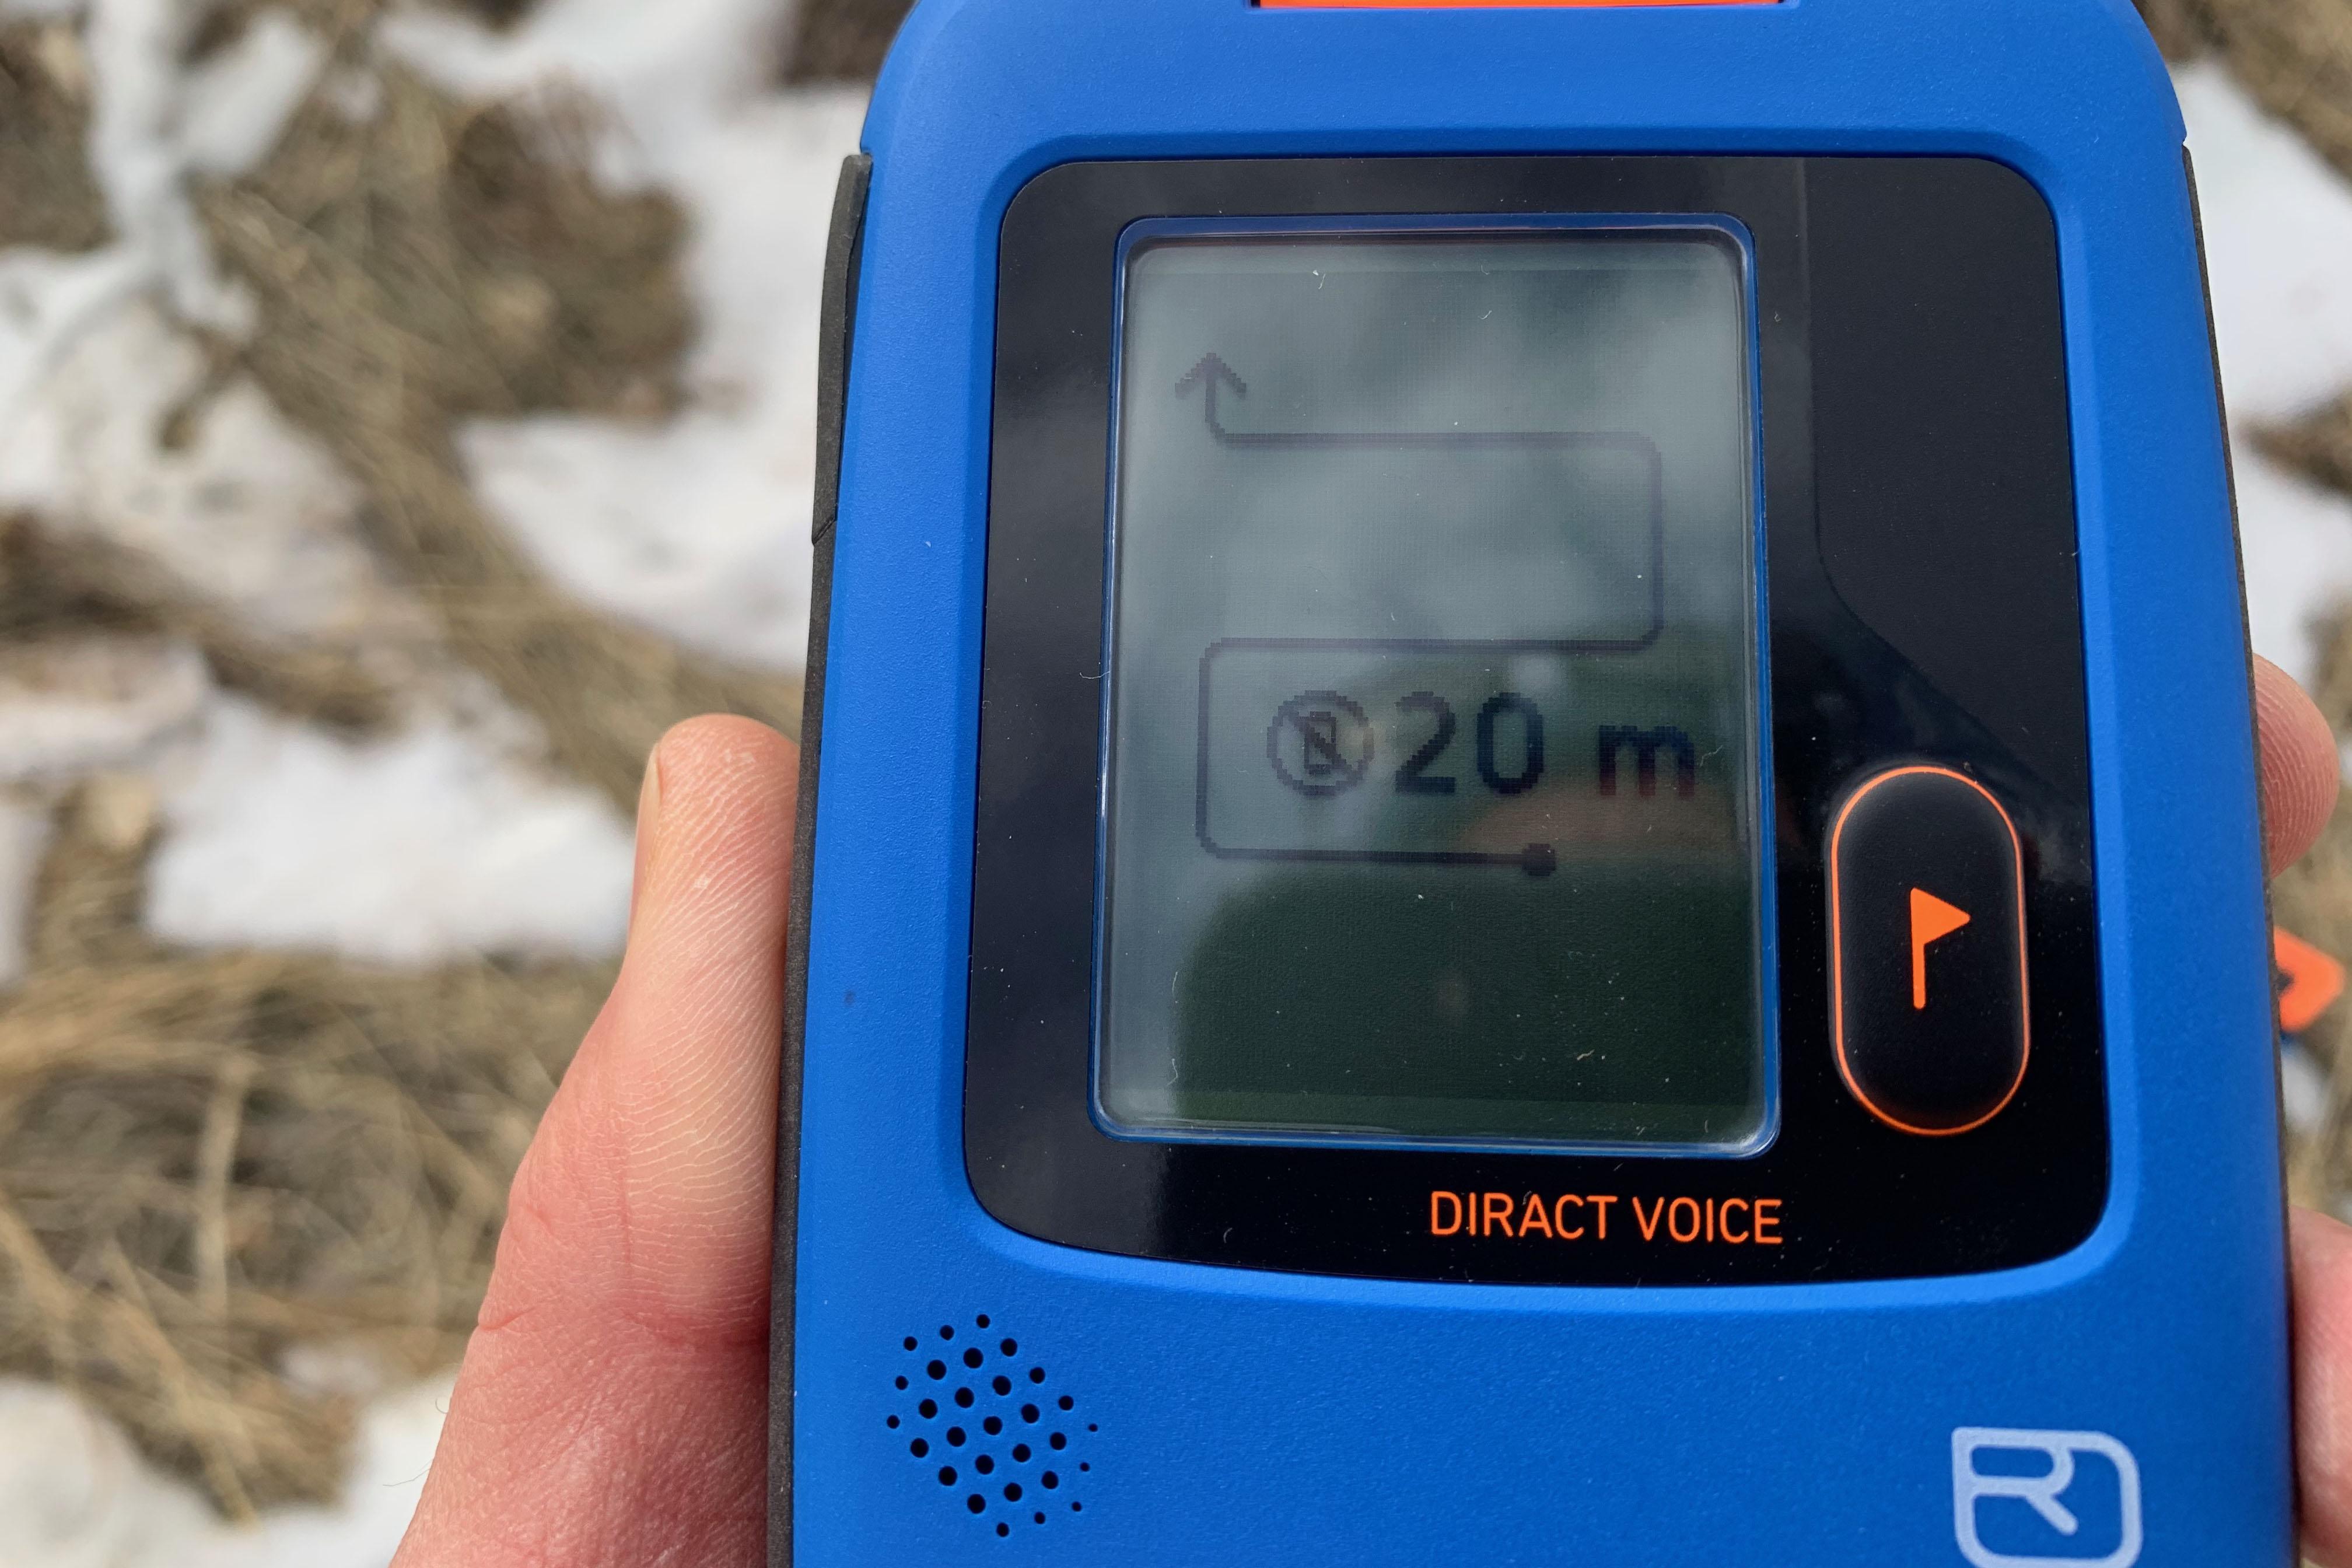 Ortovox Diract Voice Avalanche Beacon